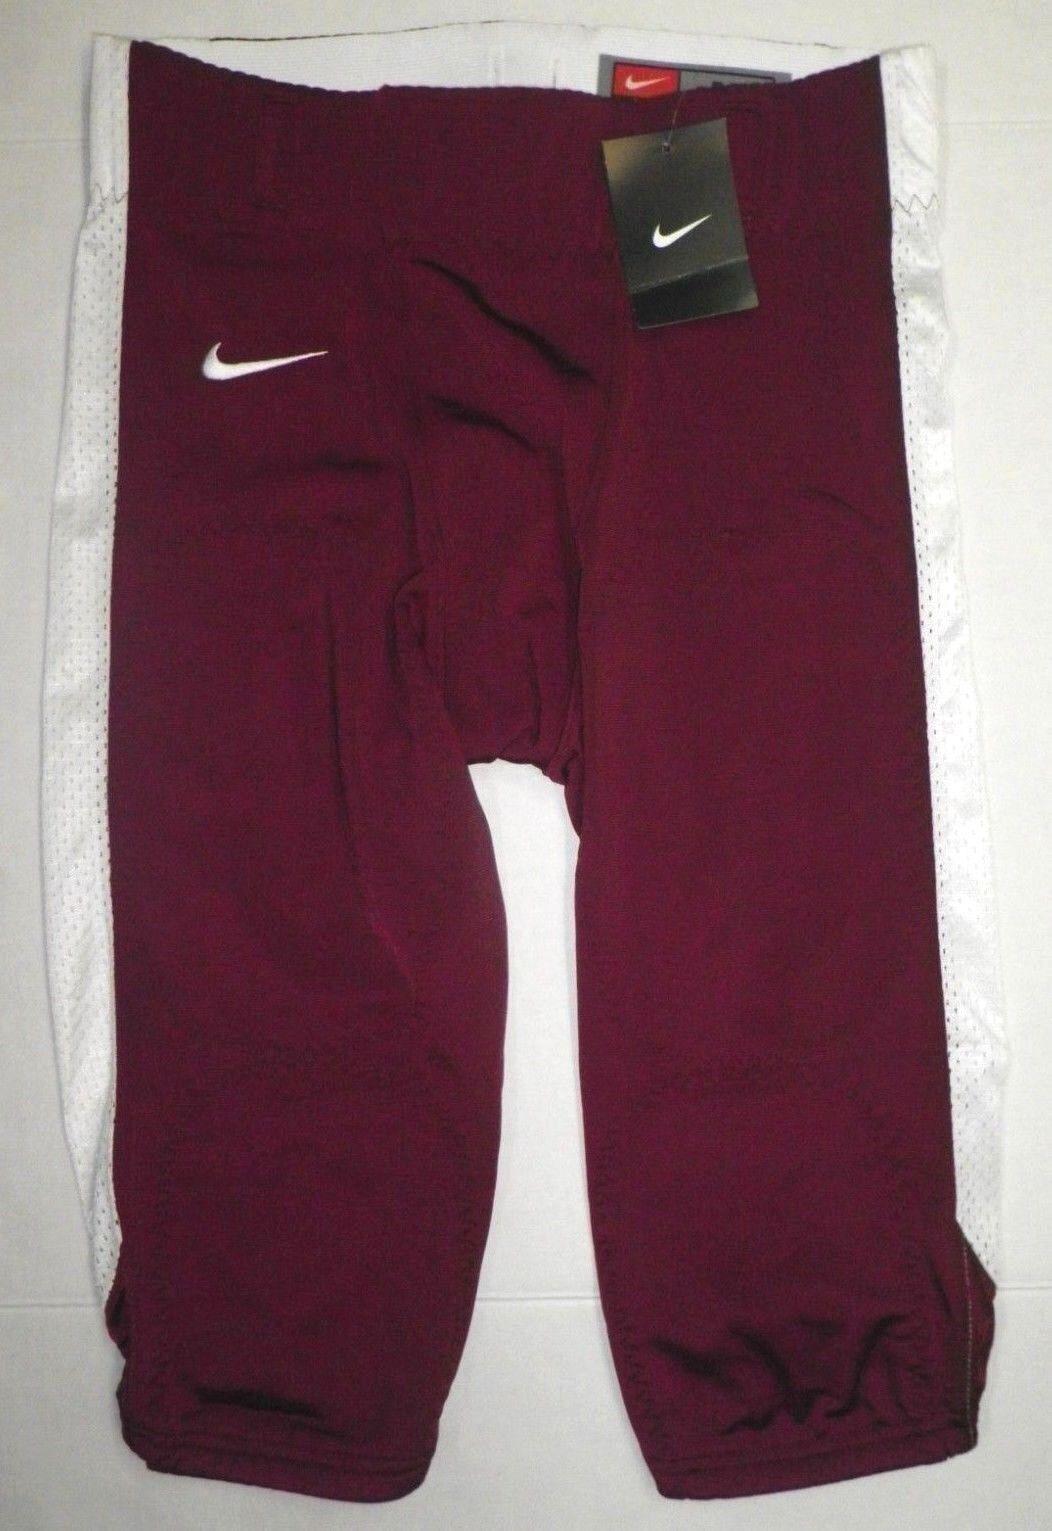 NIKE Team Mens Open Field Knee Length Football Pants Tights 615745 MAROON S M L